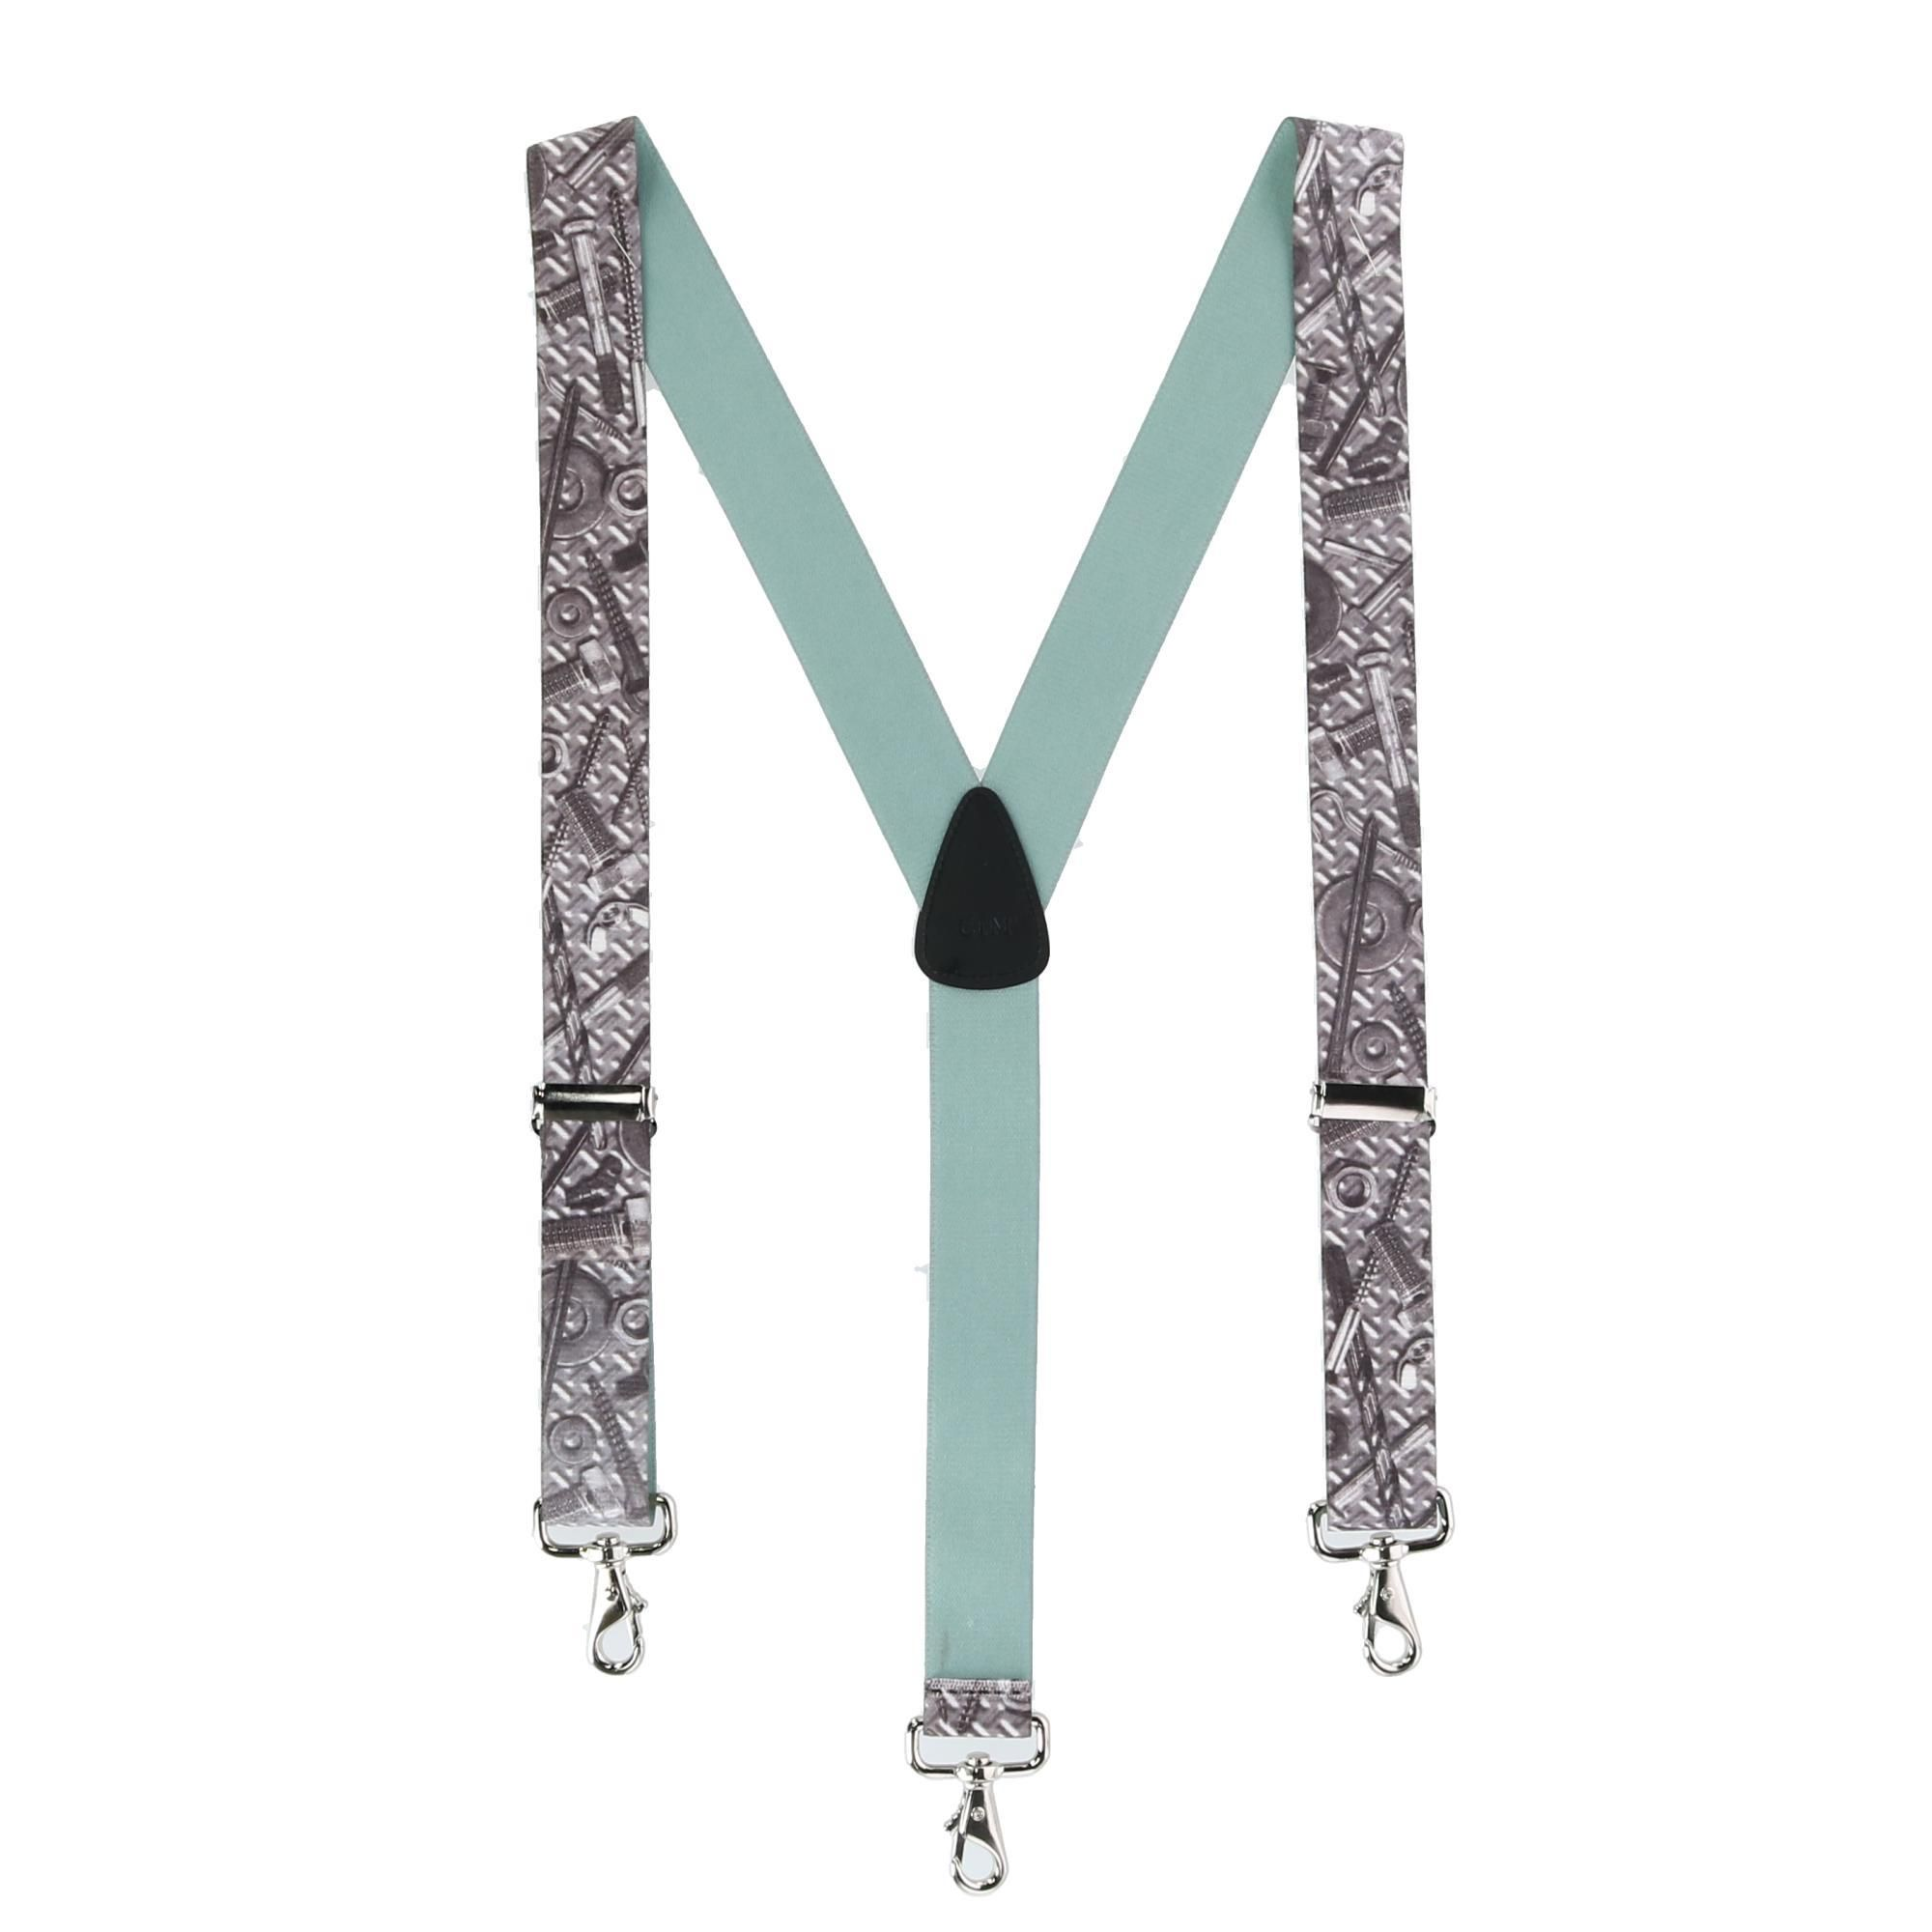 CTM Mens Elastic Craftsman Novelty Suspenders with Swivel Hook Clips